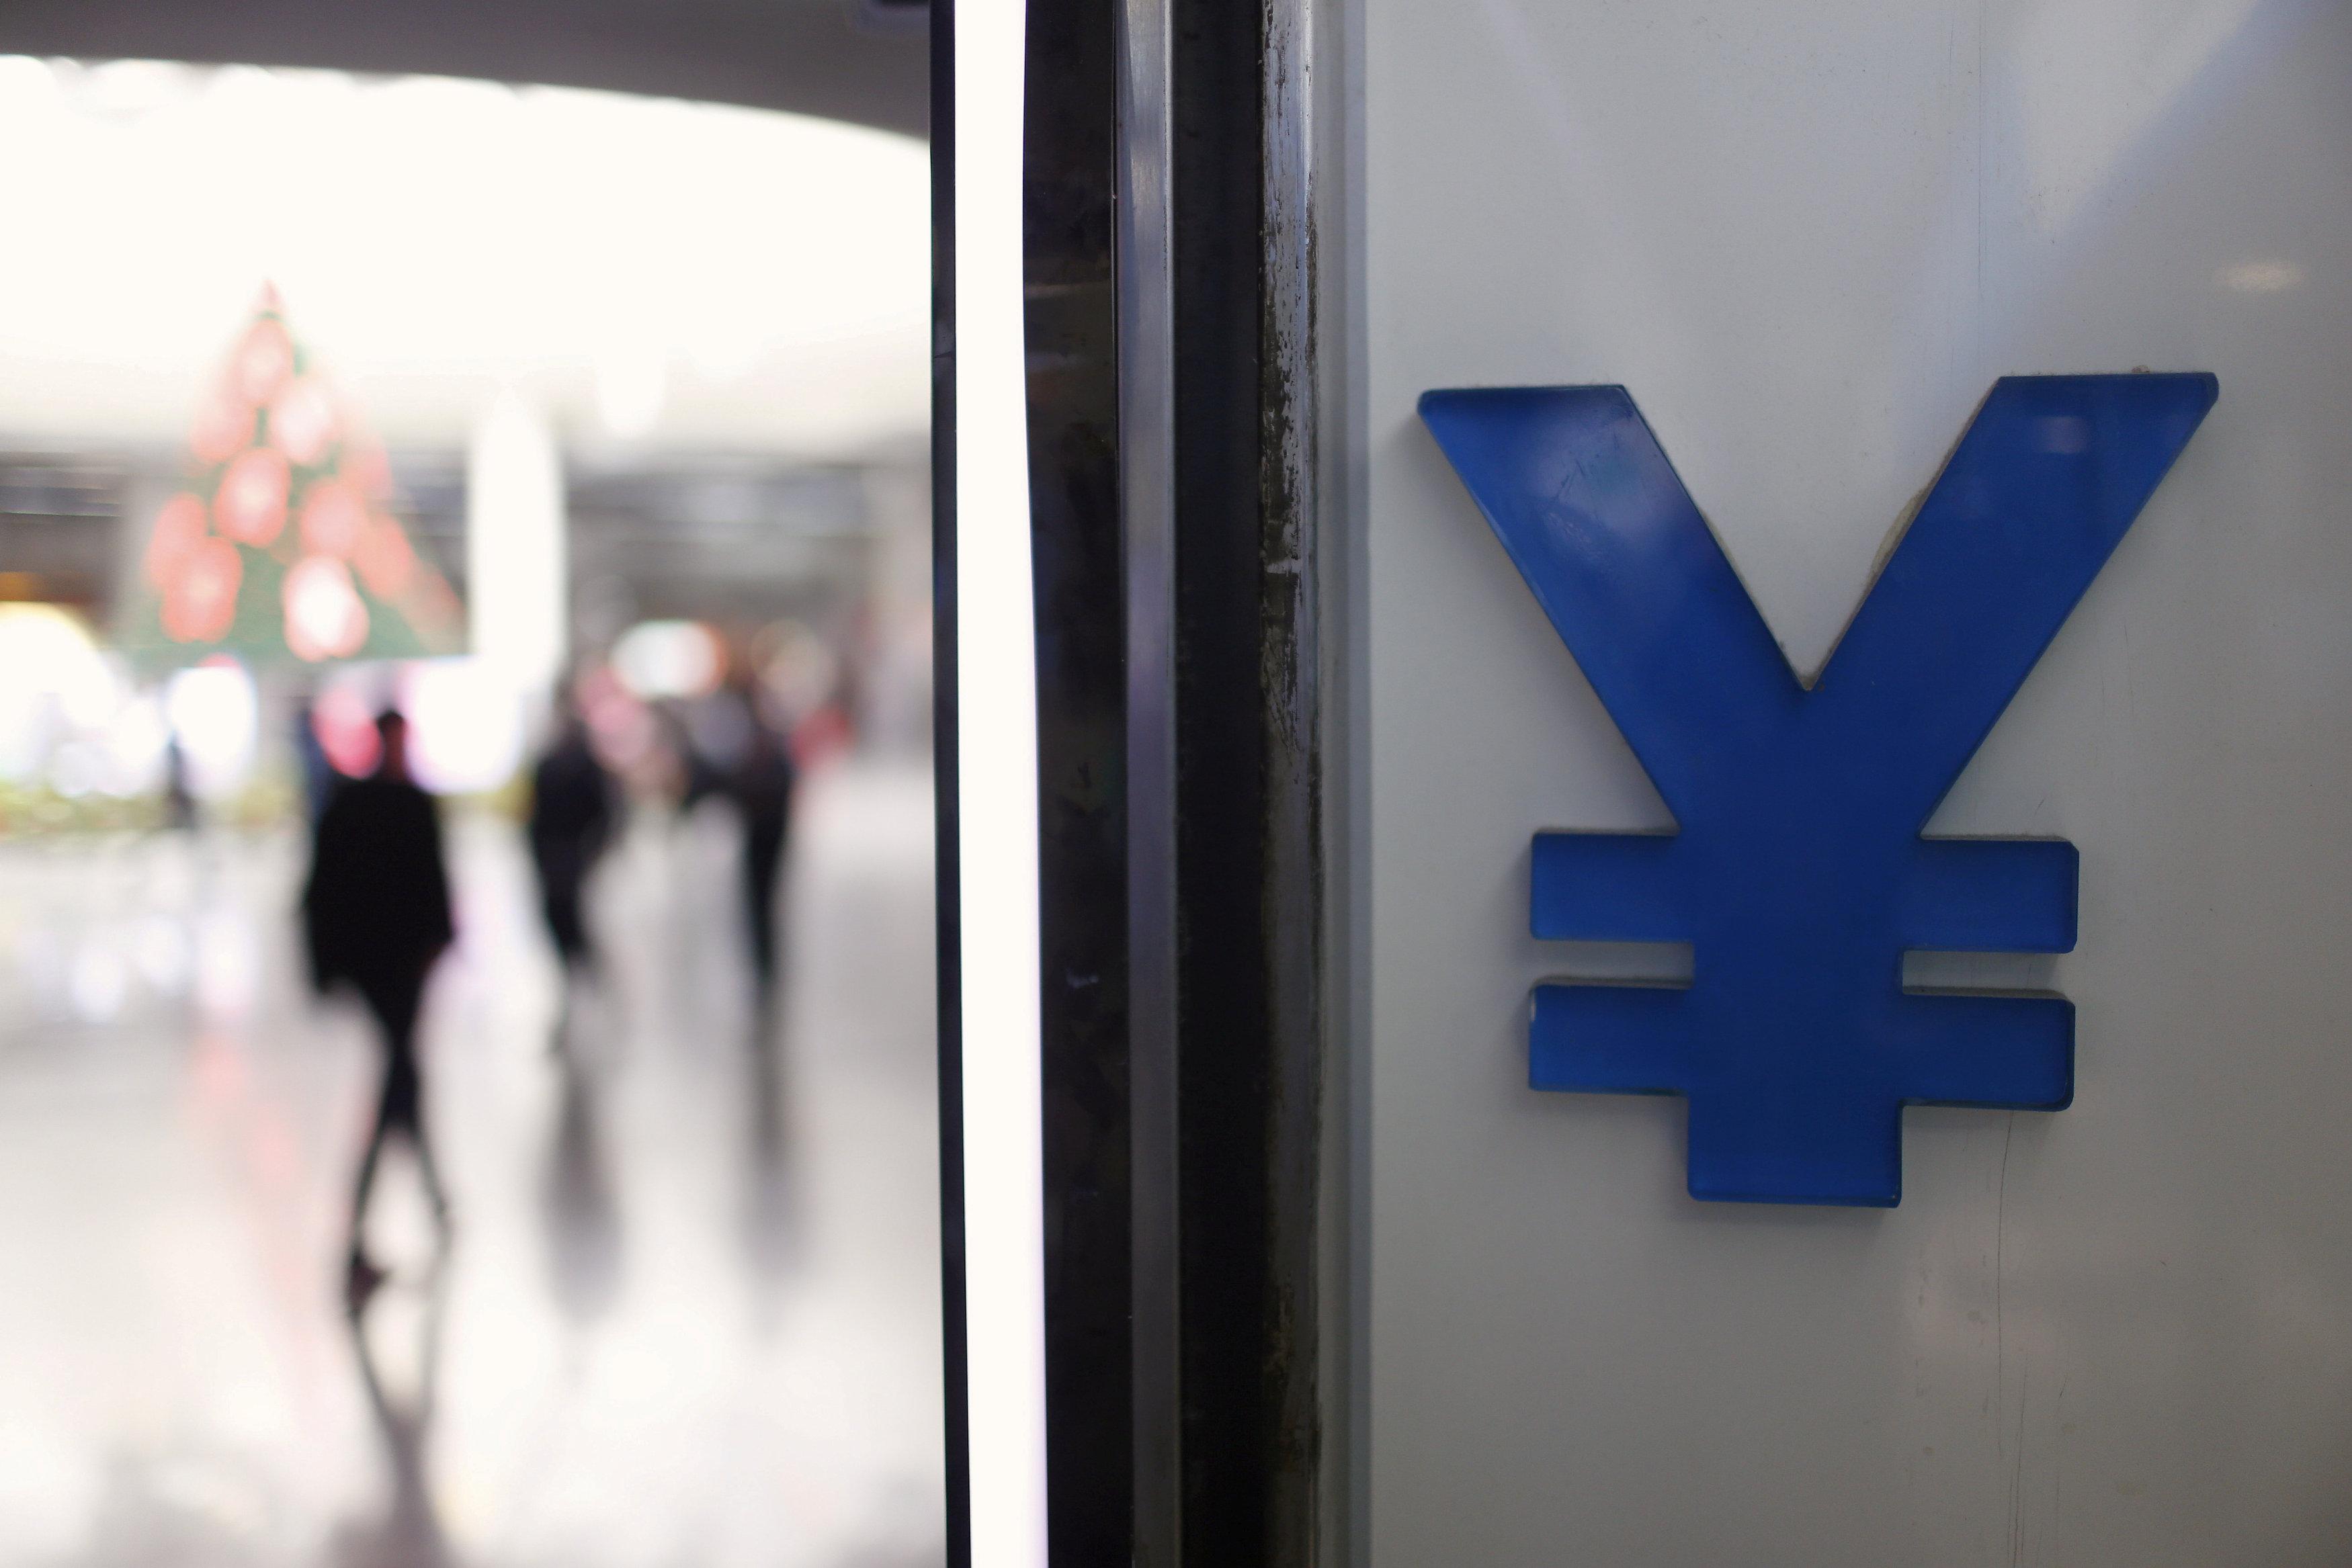 logo of yuan